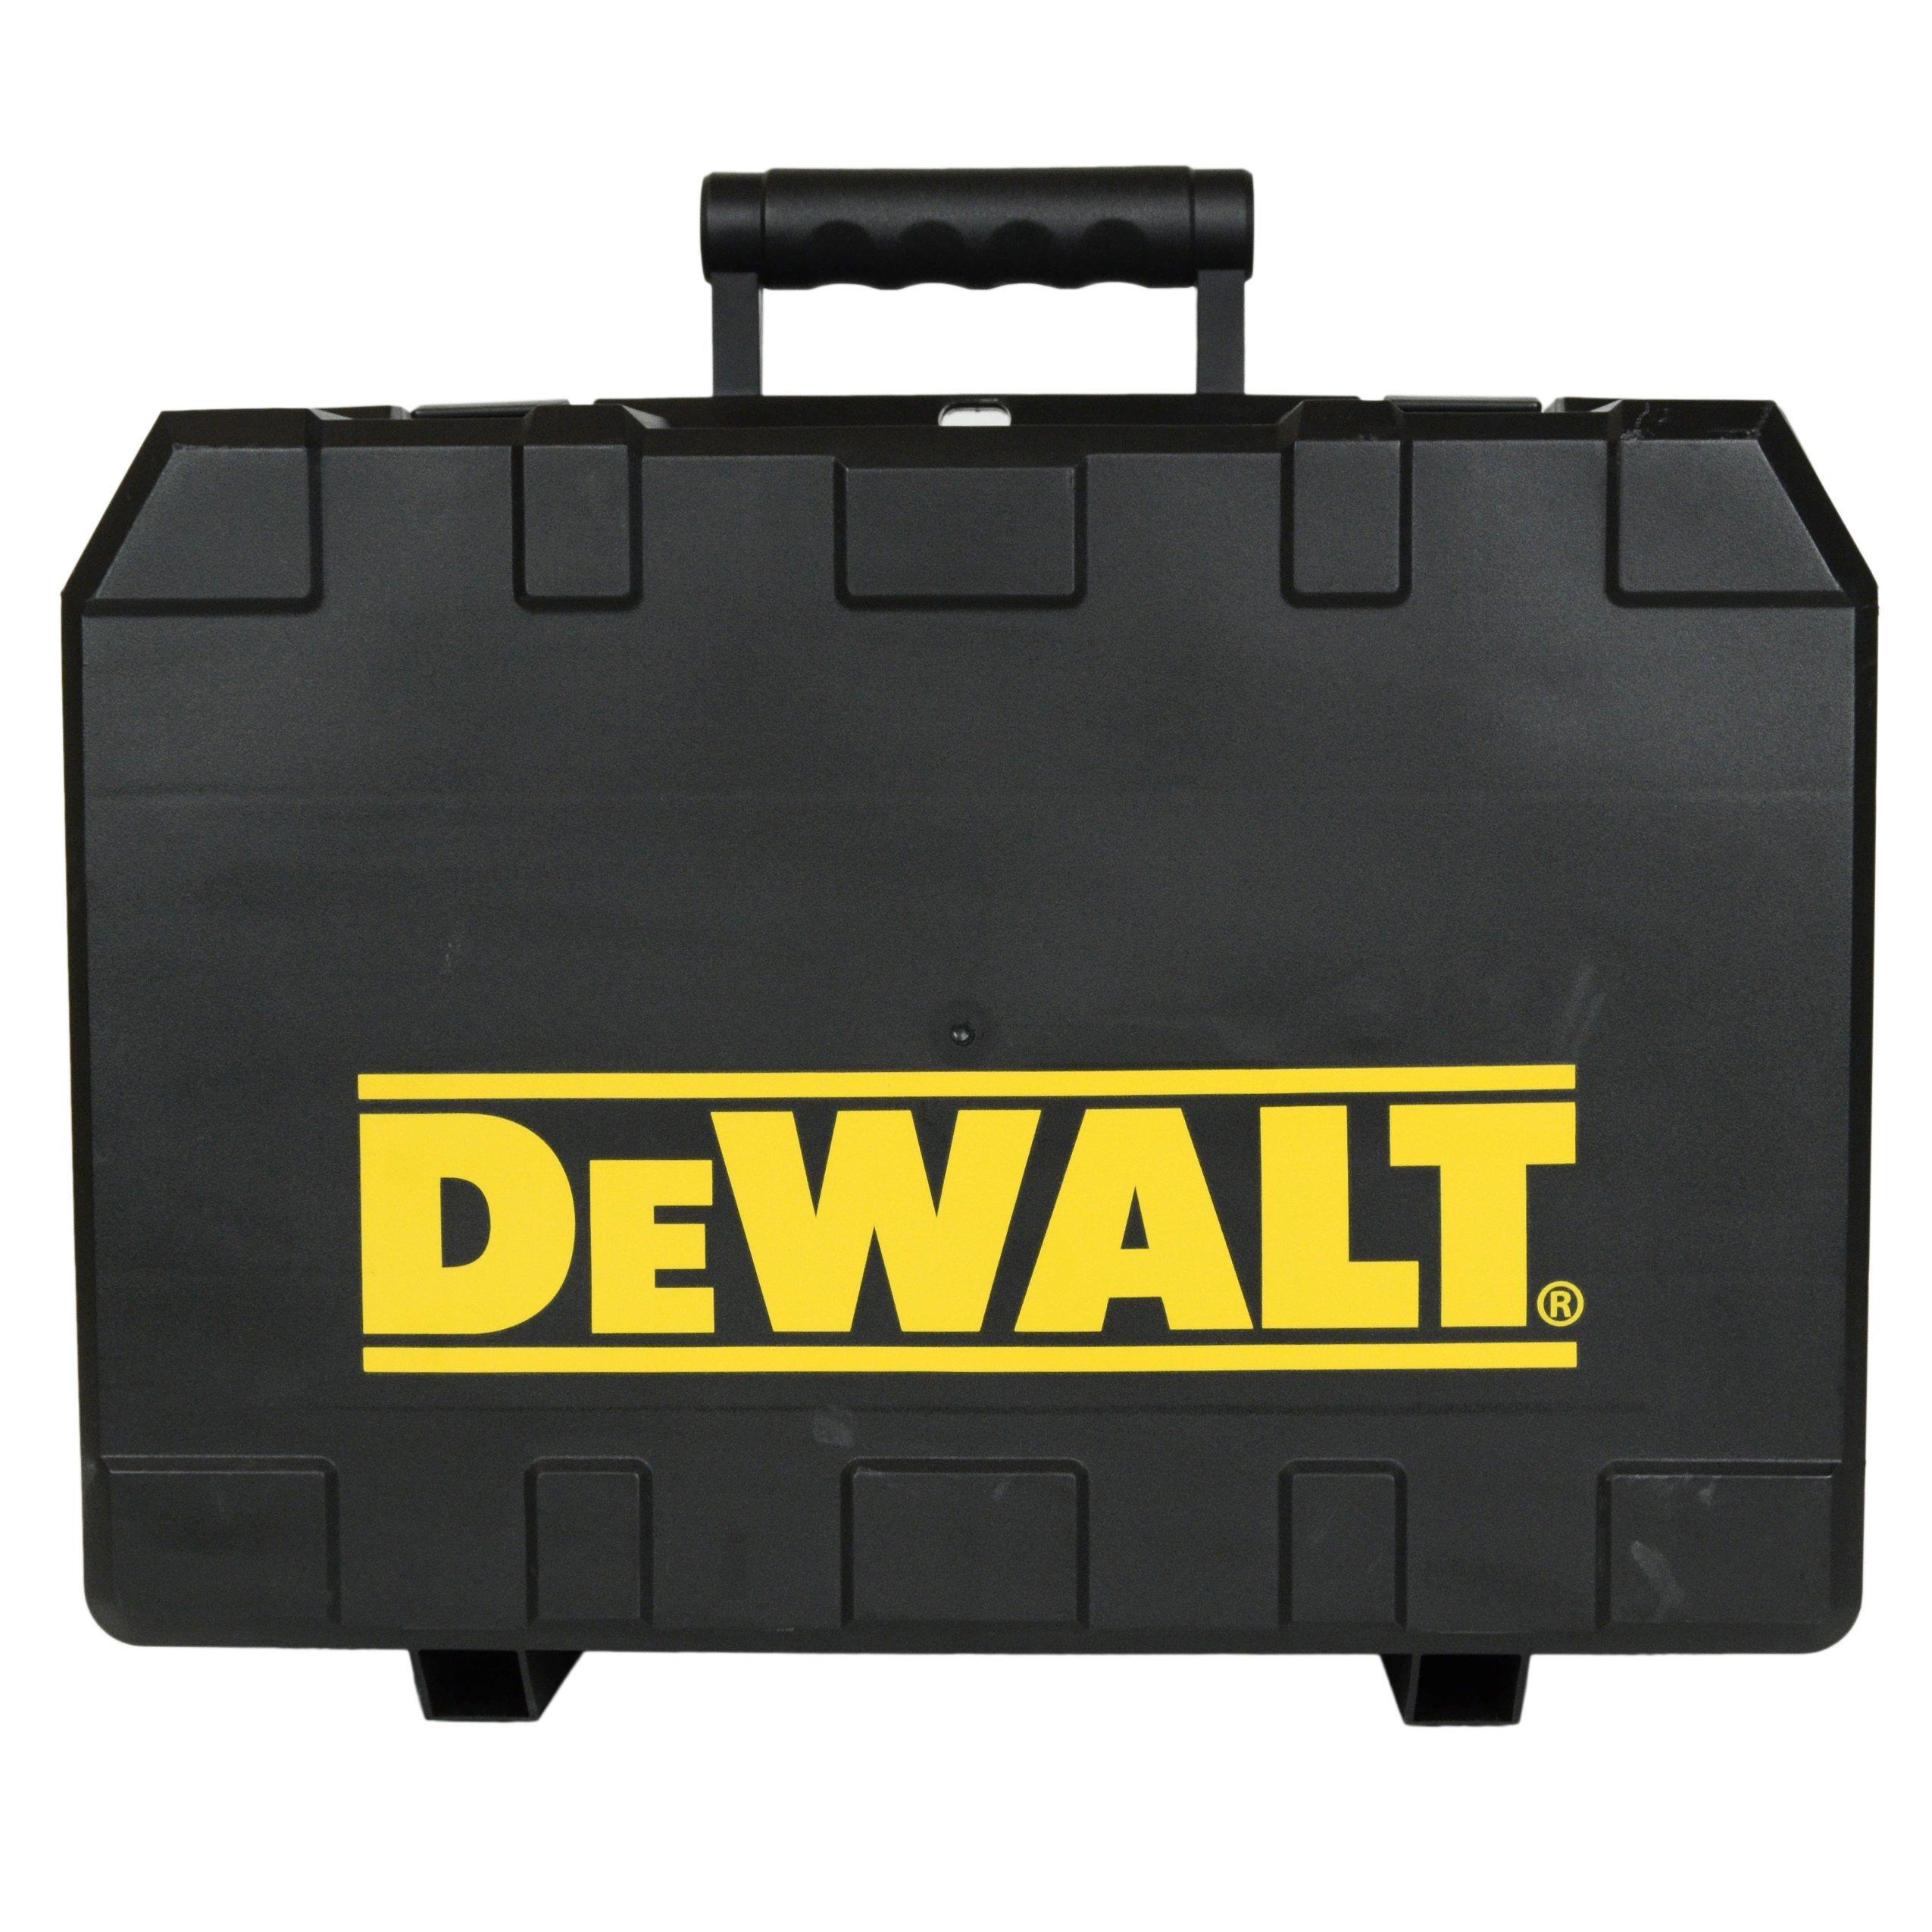 Dewalt Hard Circular Saw Tool Case for DCS373 DCS392 DCS372 DC390 DW936